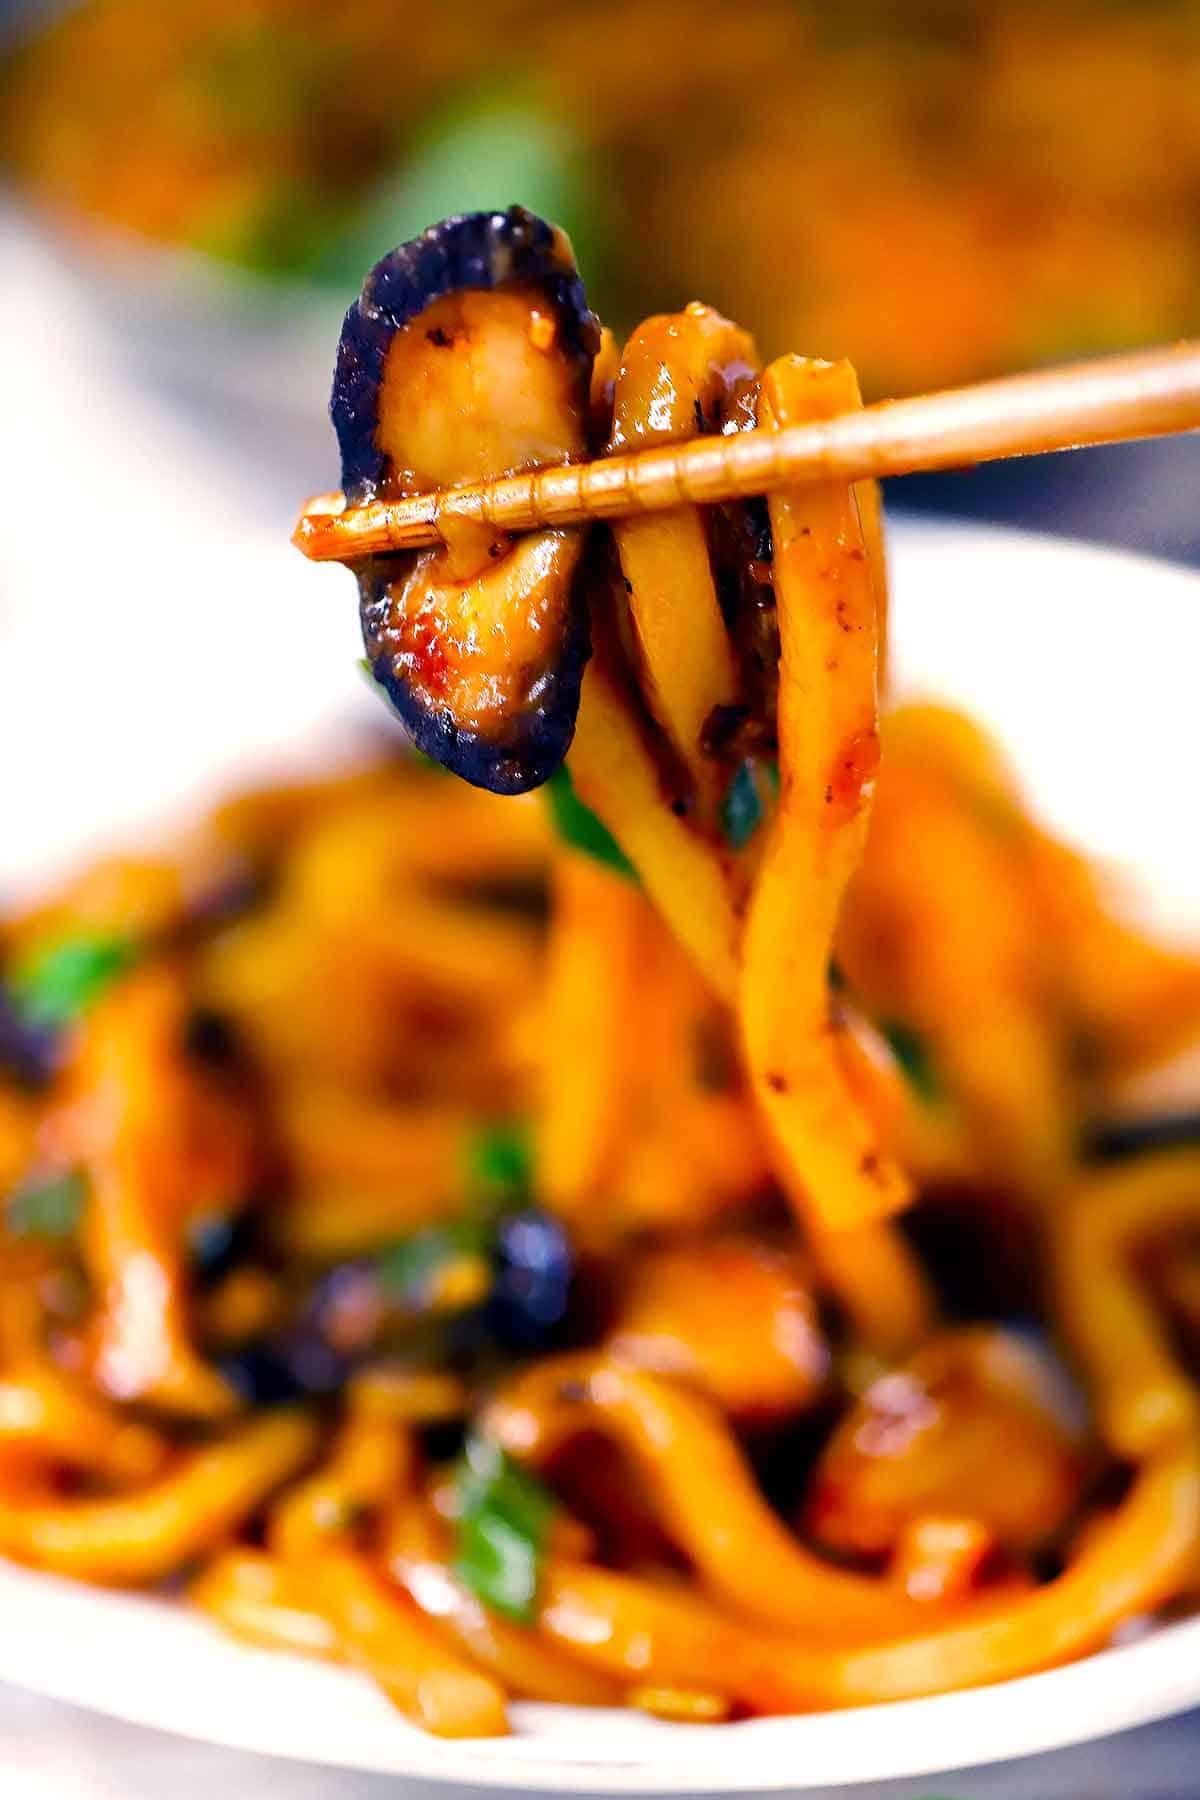 Chopsticks holding udon noodles and mushrooms.